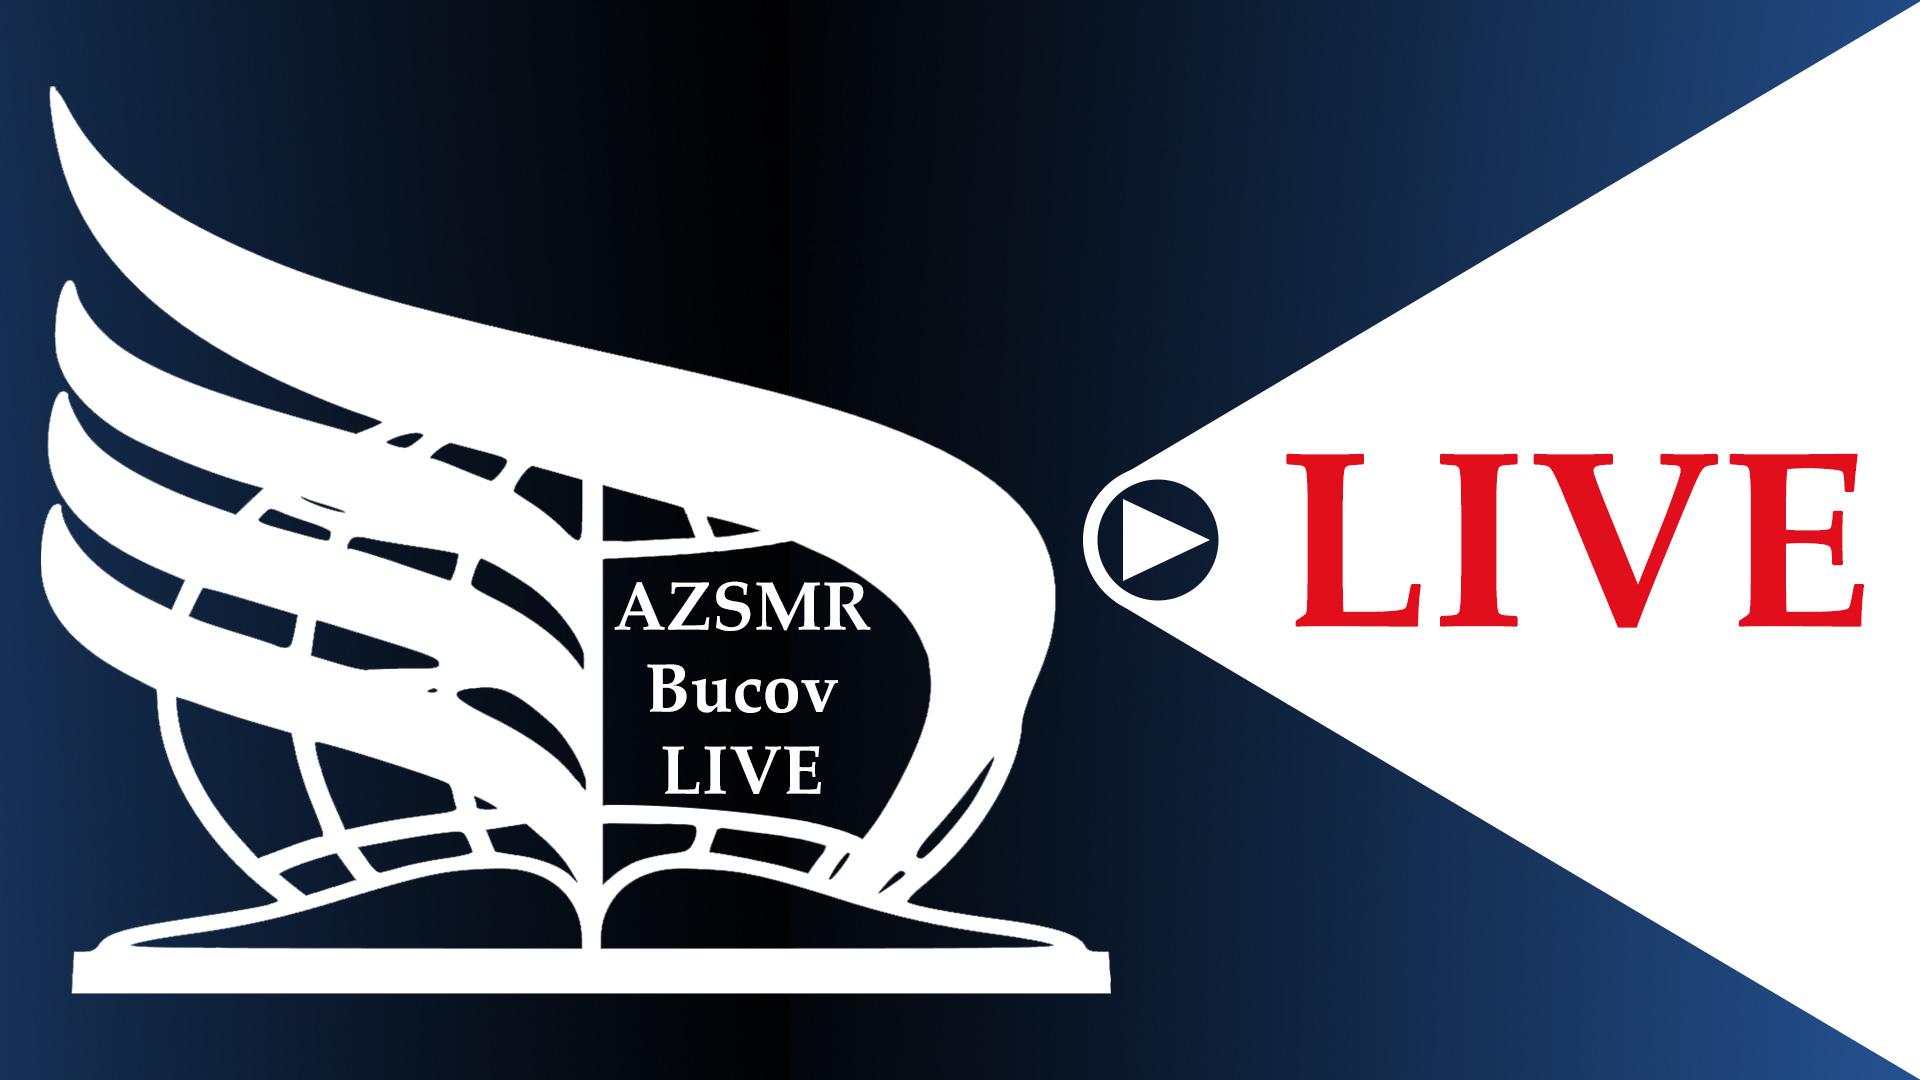 AZSMR-Bucov LIVE